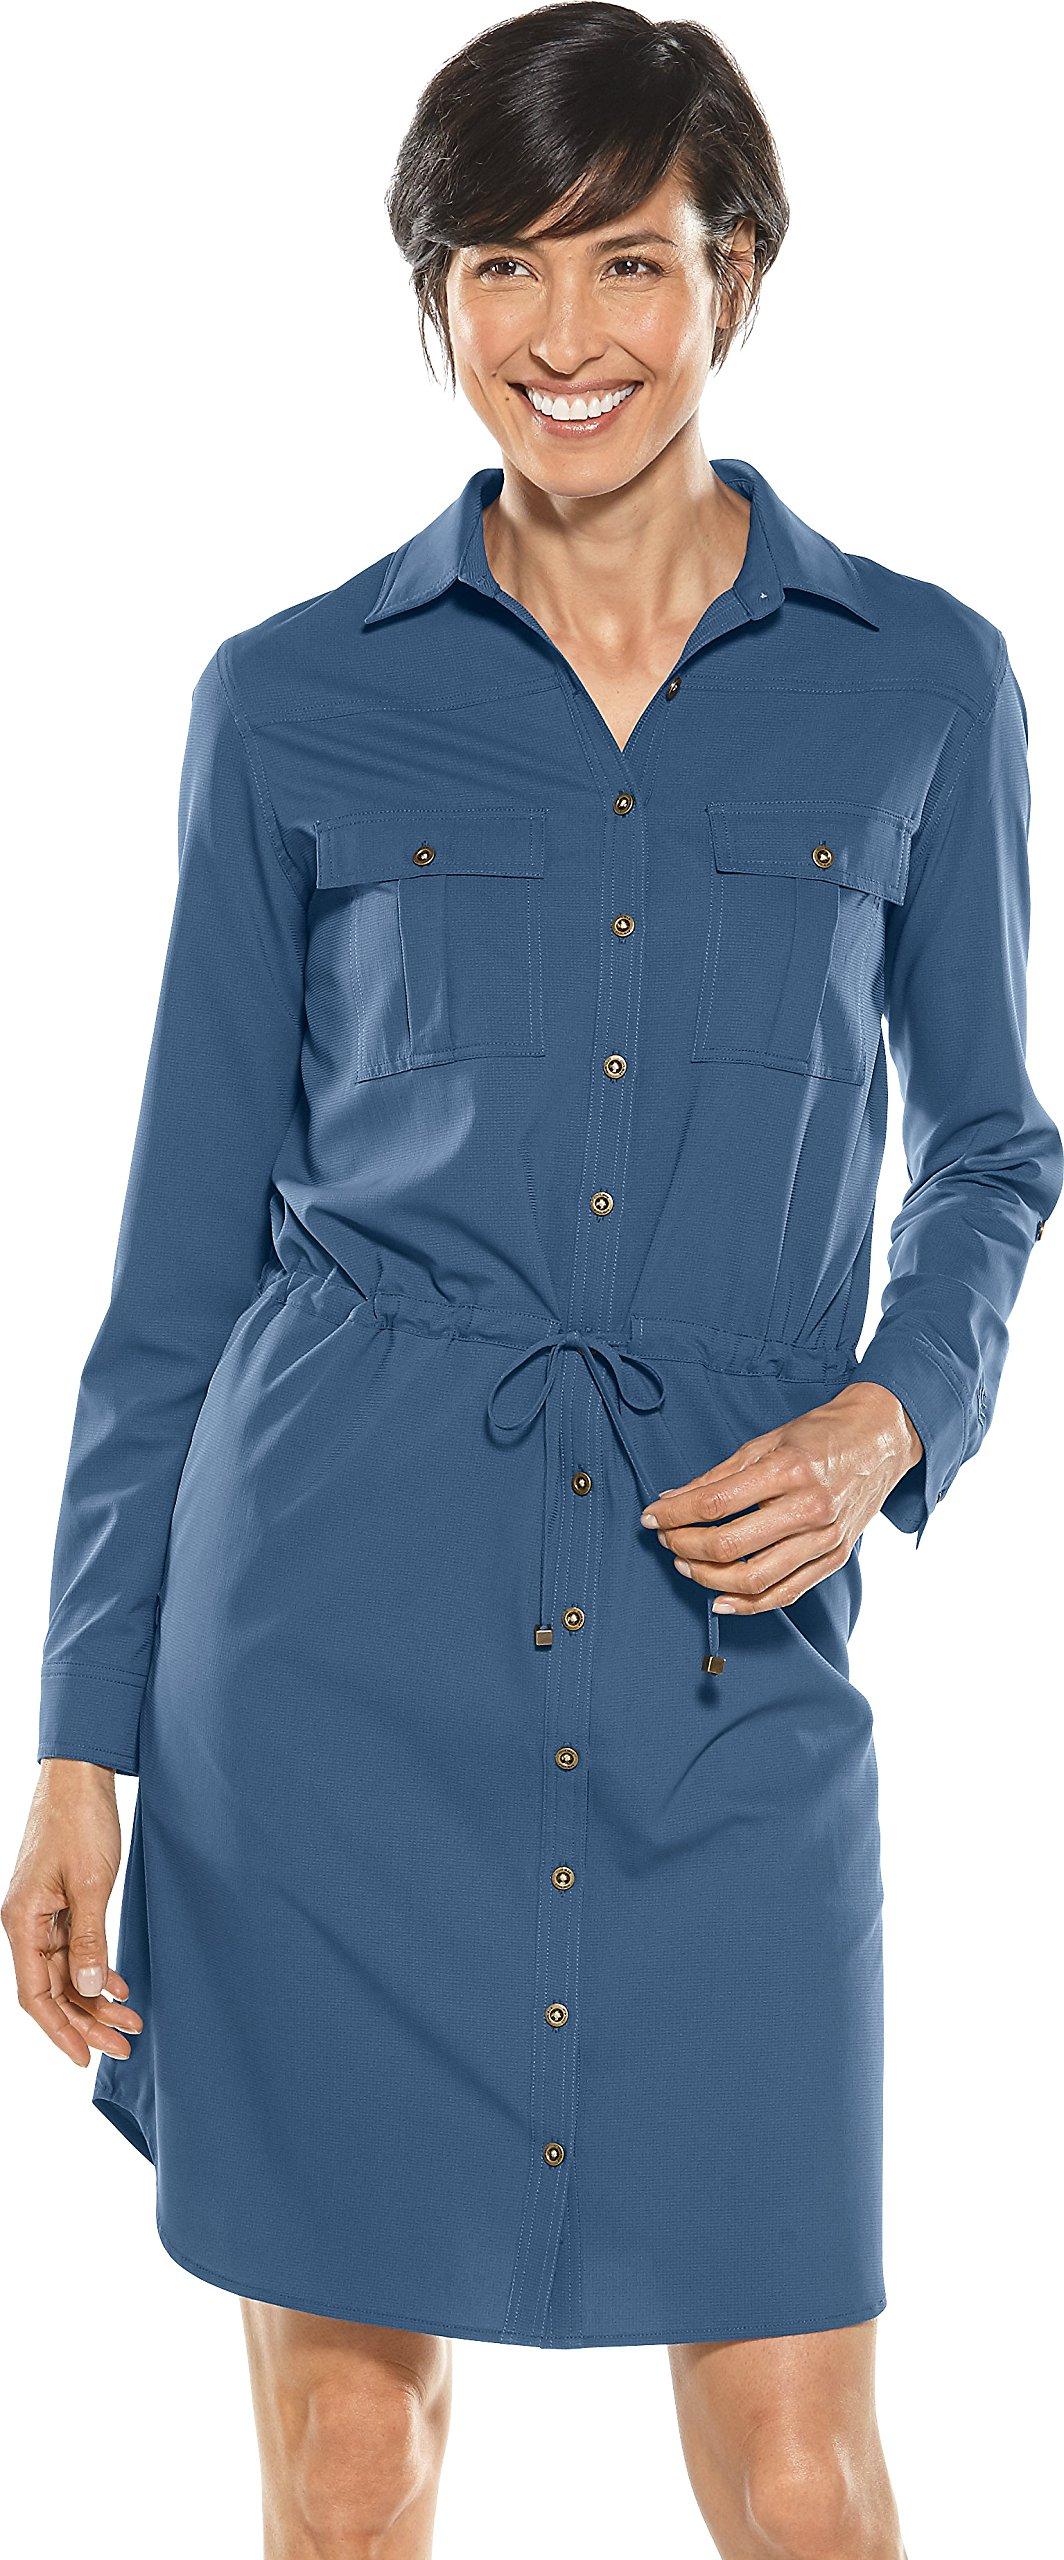 Coolibar UPF 50+ Women's Travel Shirt Dress - Sun Protective (Small- Marine Navy)